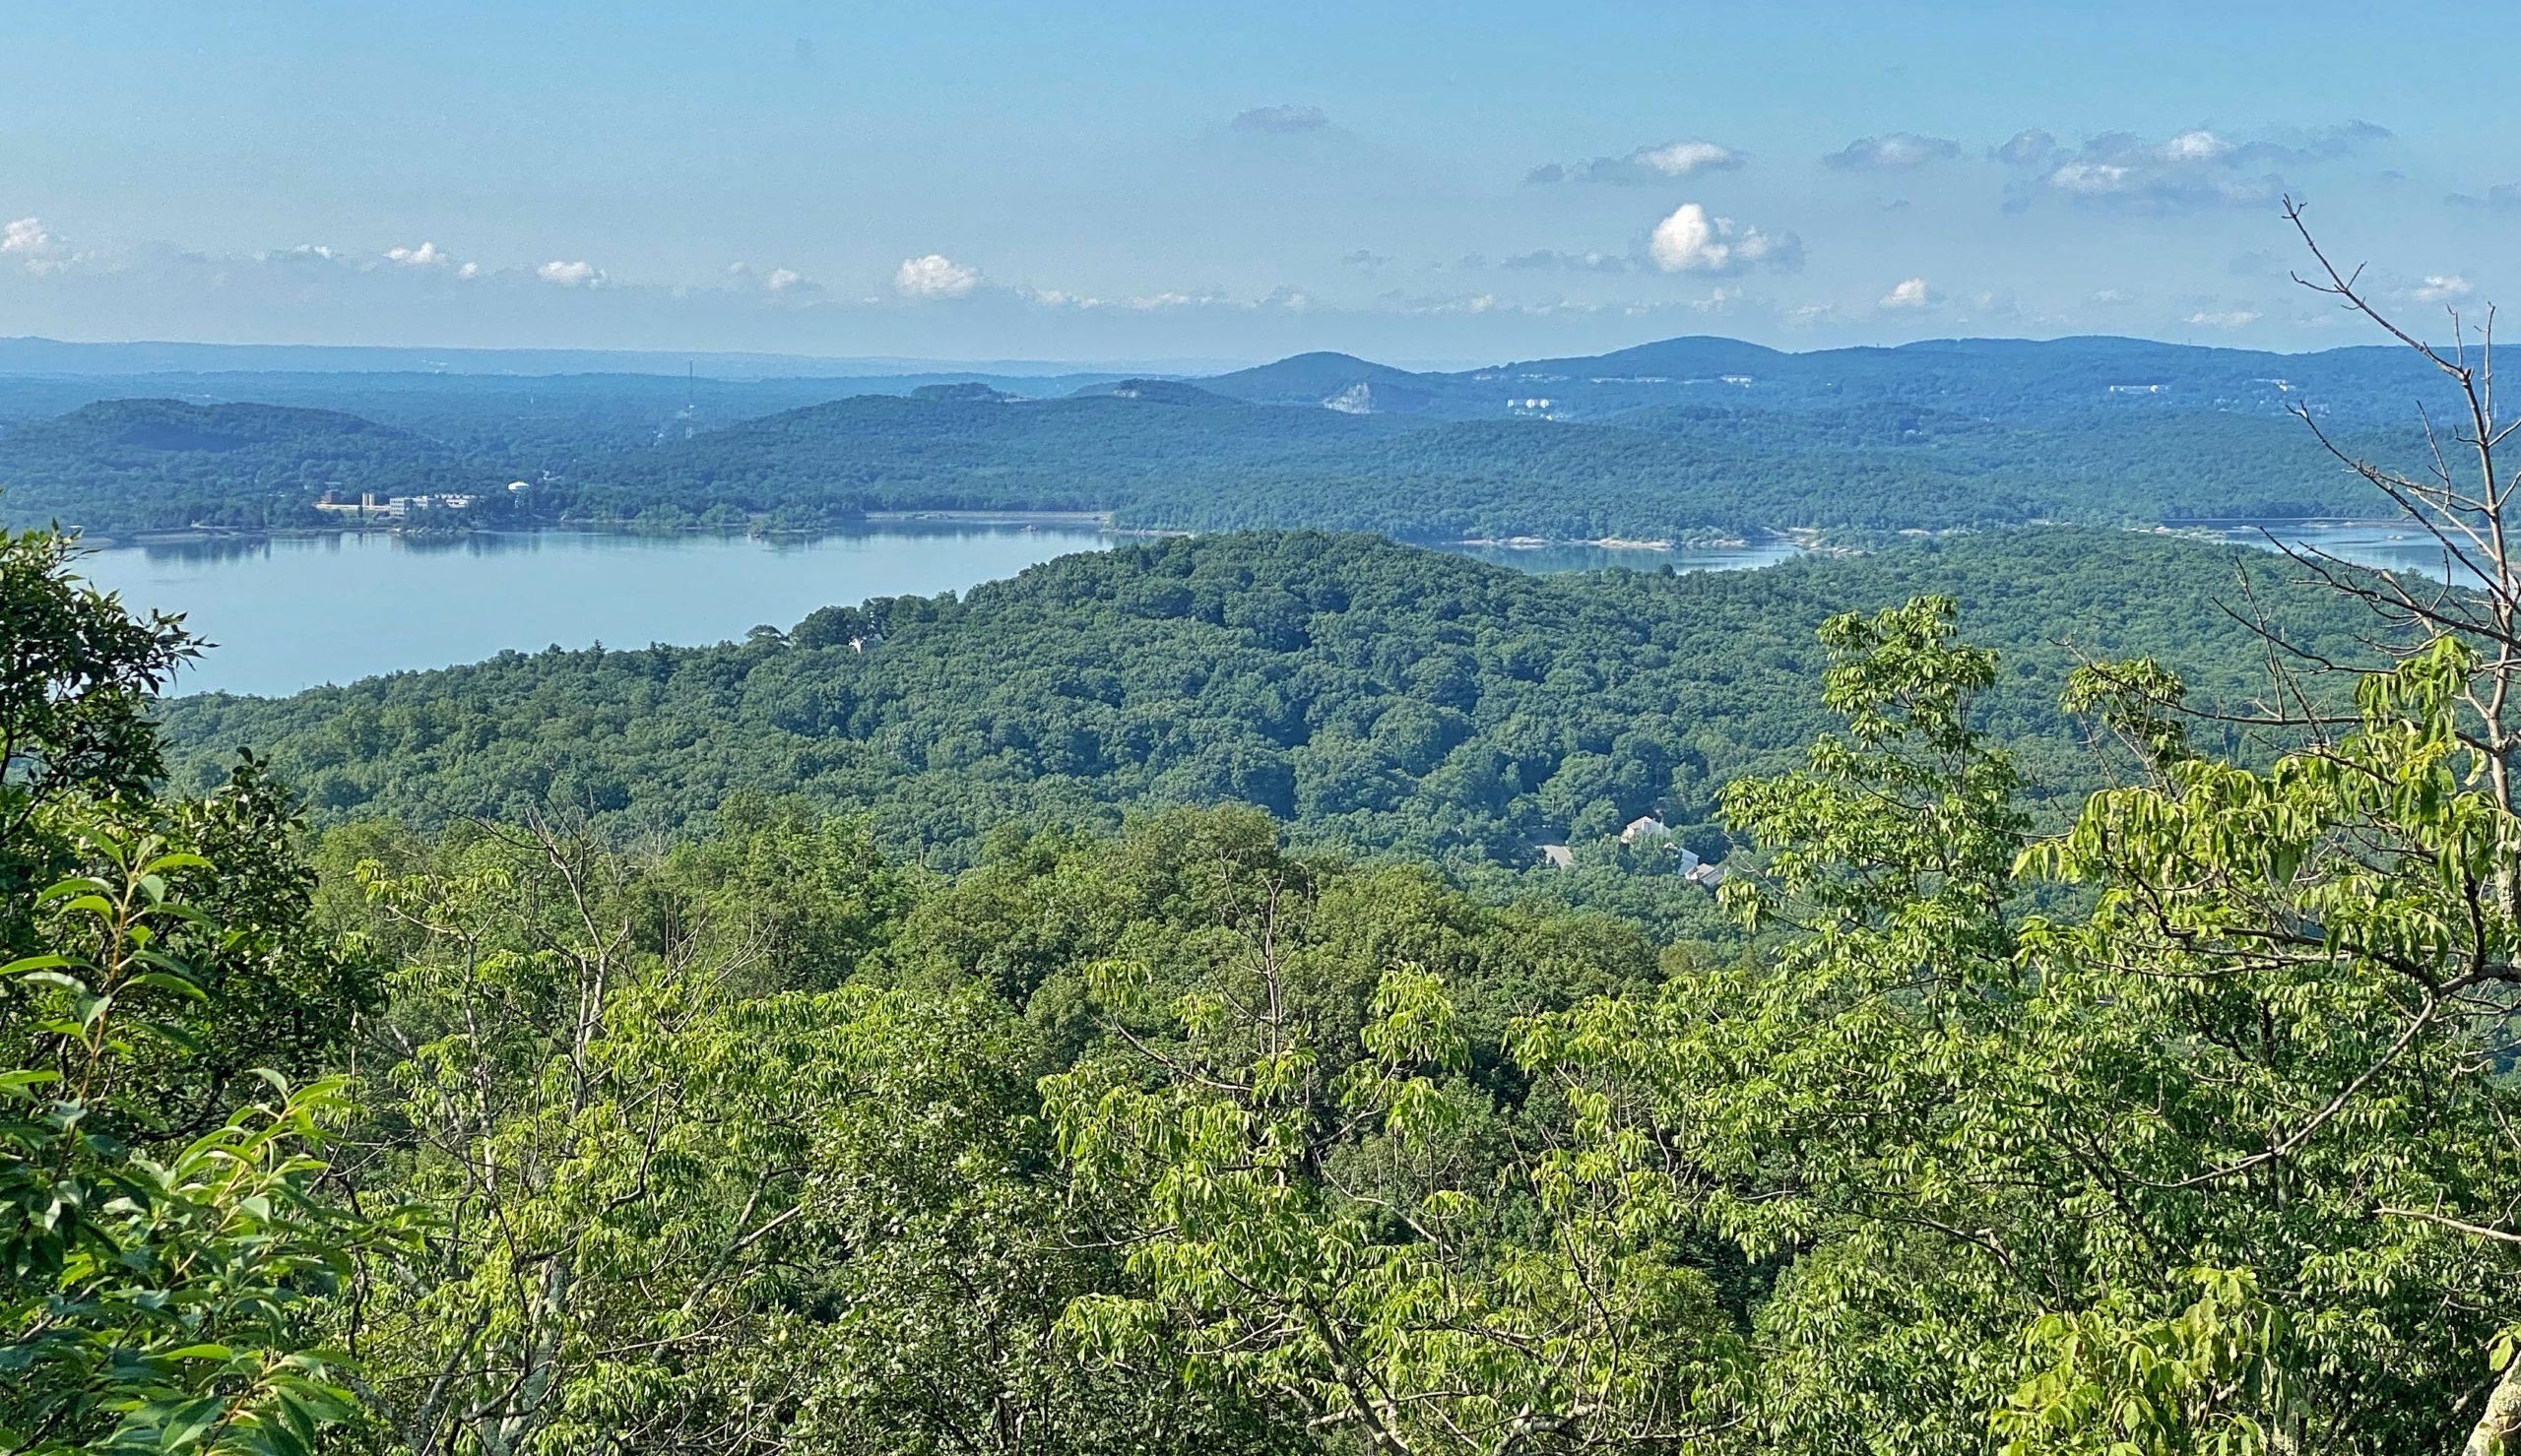 View southeast from Windbeam Mountain